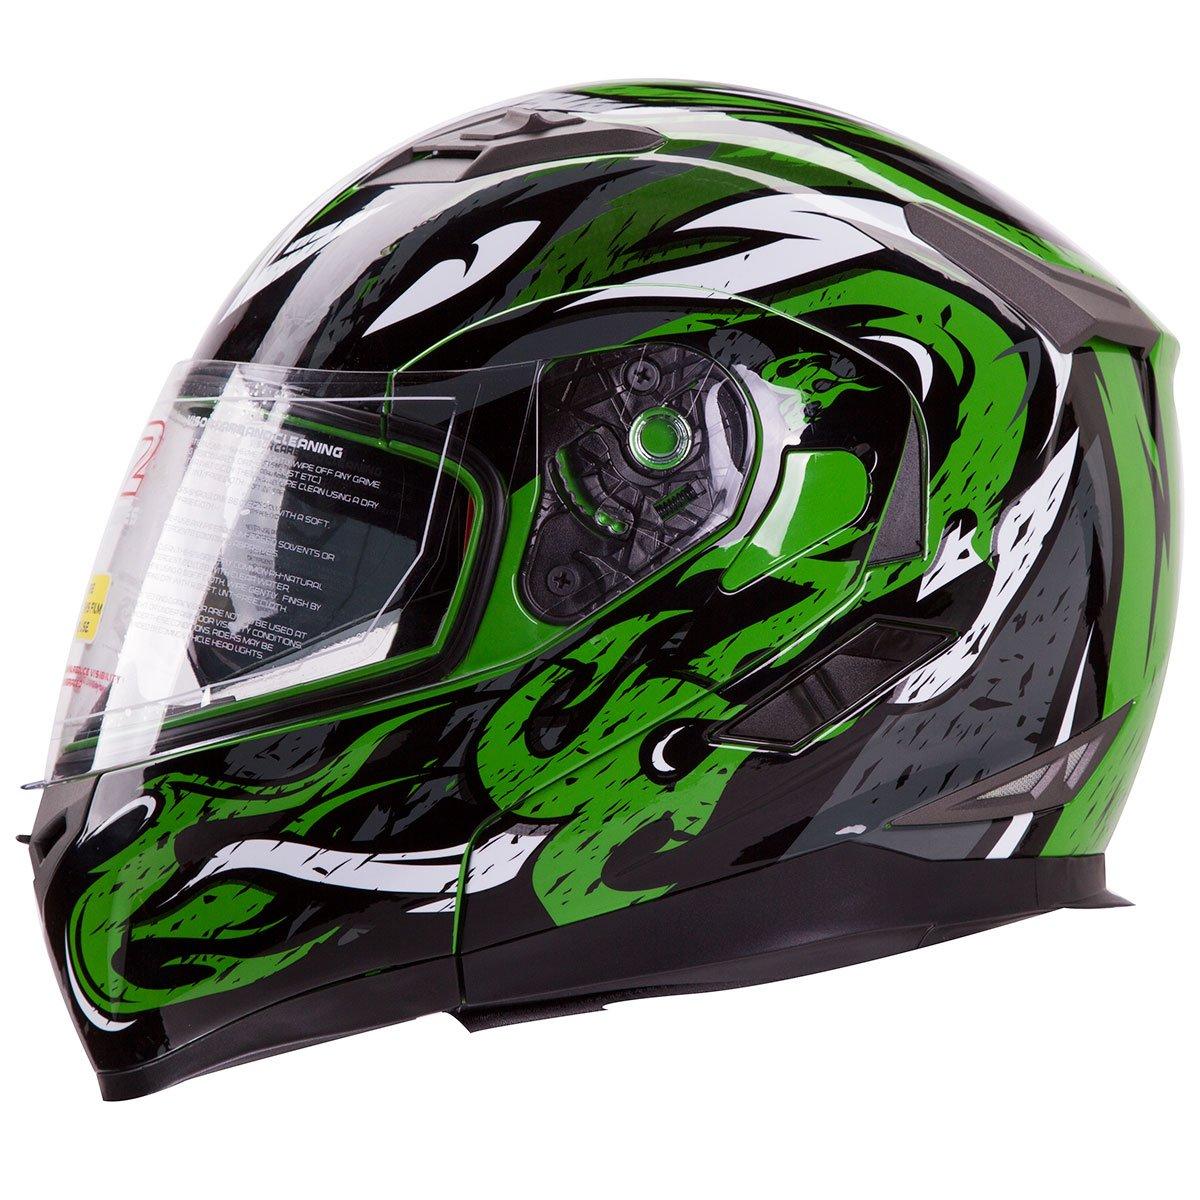 Amazoncom VIPER Modular Dual Visor Motorcycle Snowmobile - Motorcycle helmet decals graphicsmotorcycle helmet graphics the easy helmet upgrade